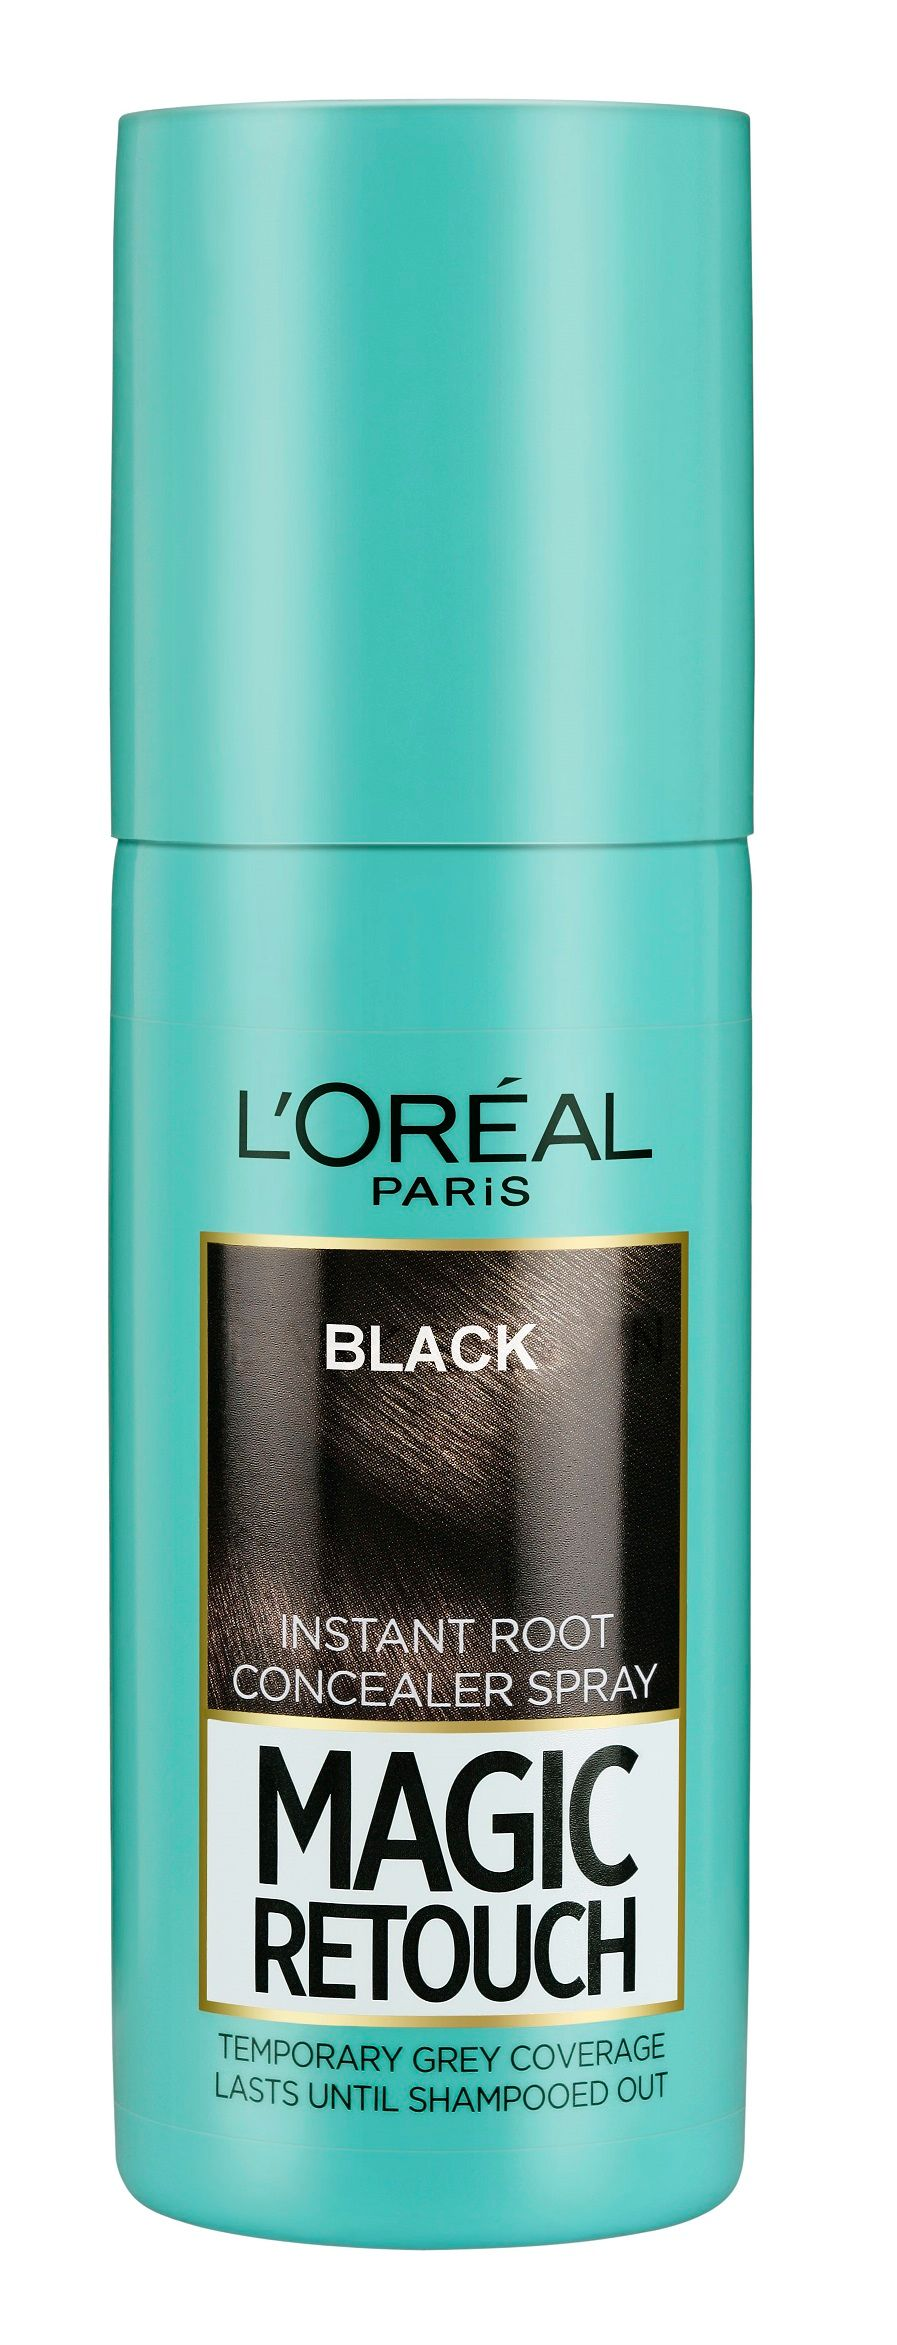 L'Oreal Paris Magic Retouch Instant Root Concealer - 1 Black, 75ml